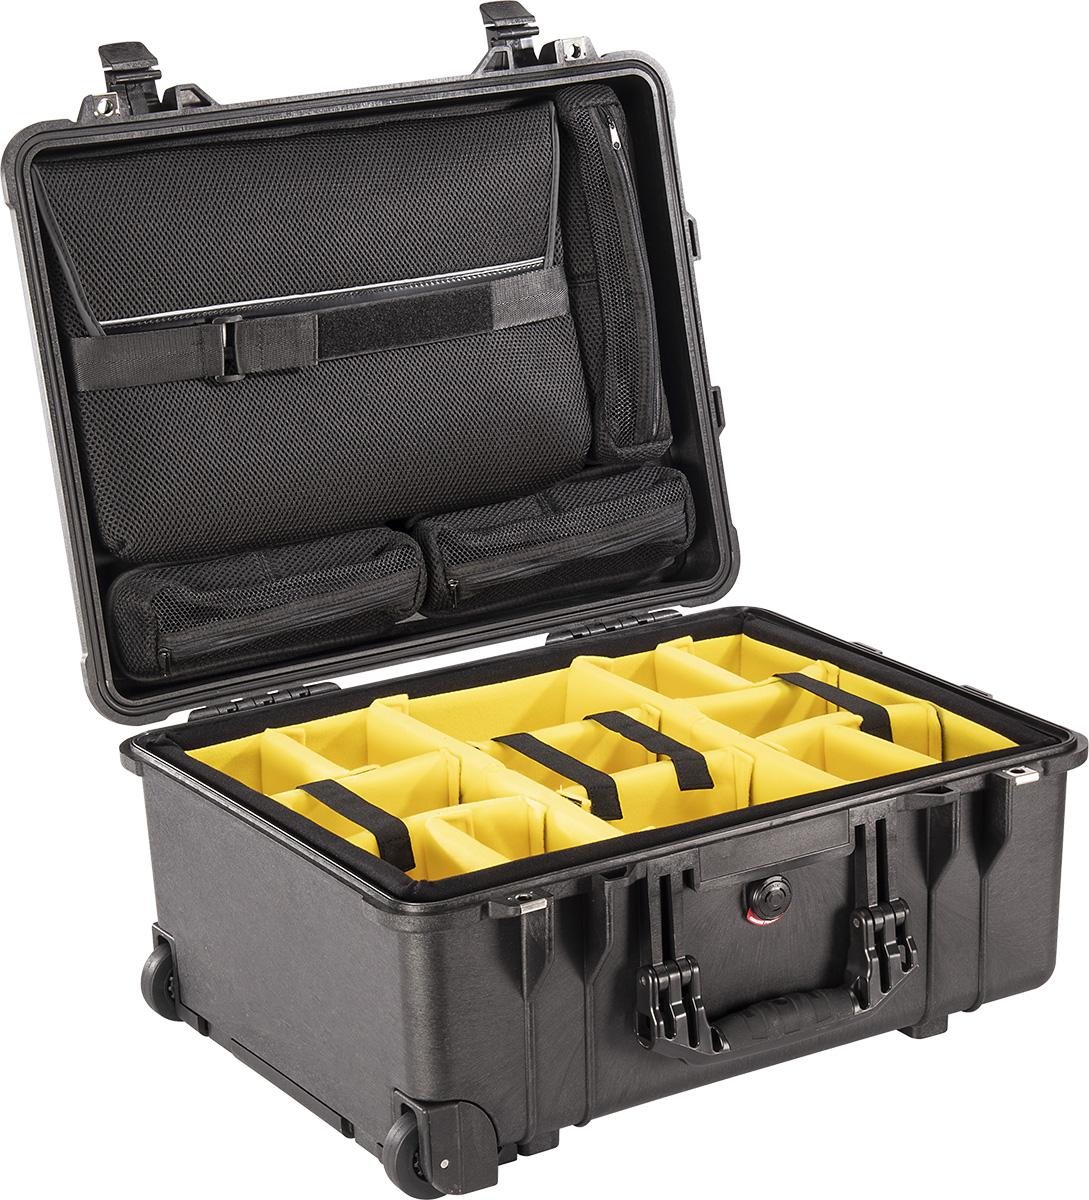 pelican protographer camera lens case